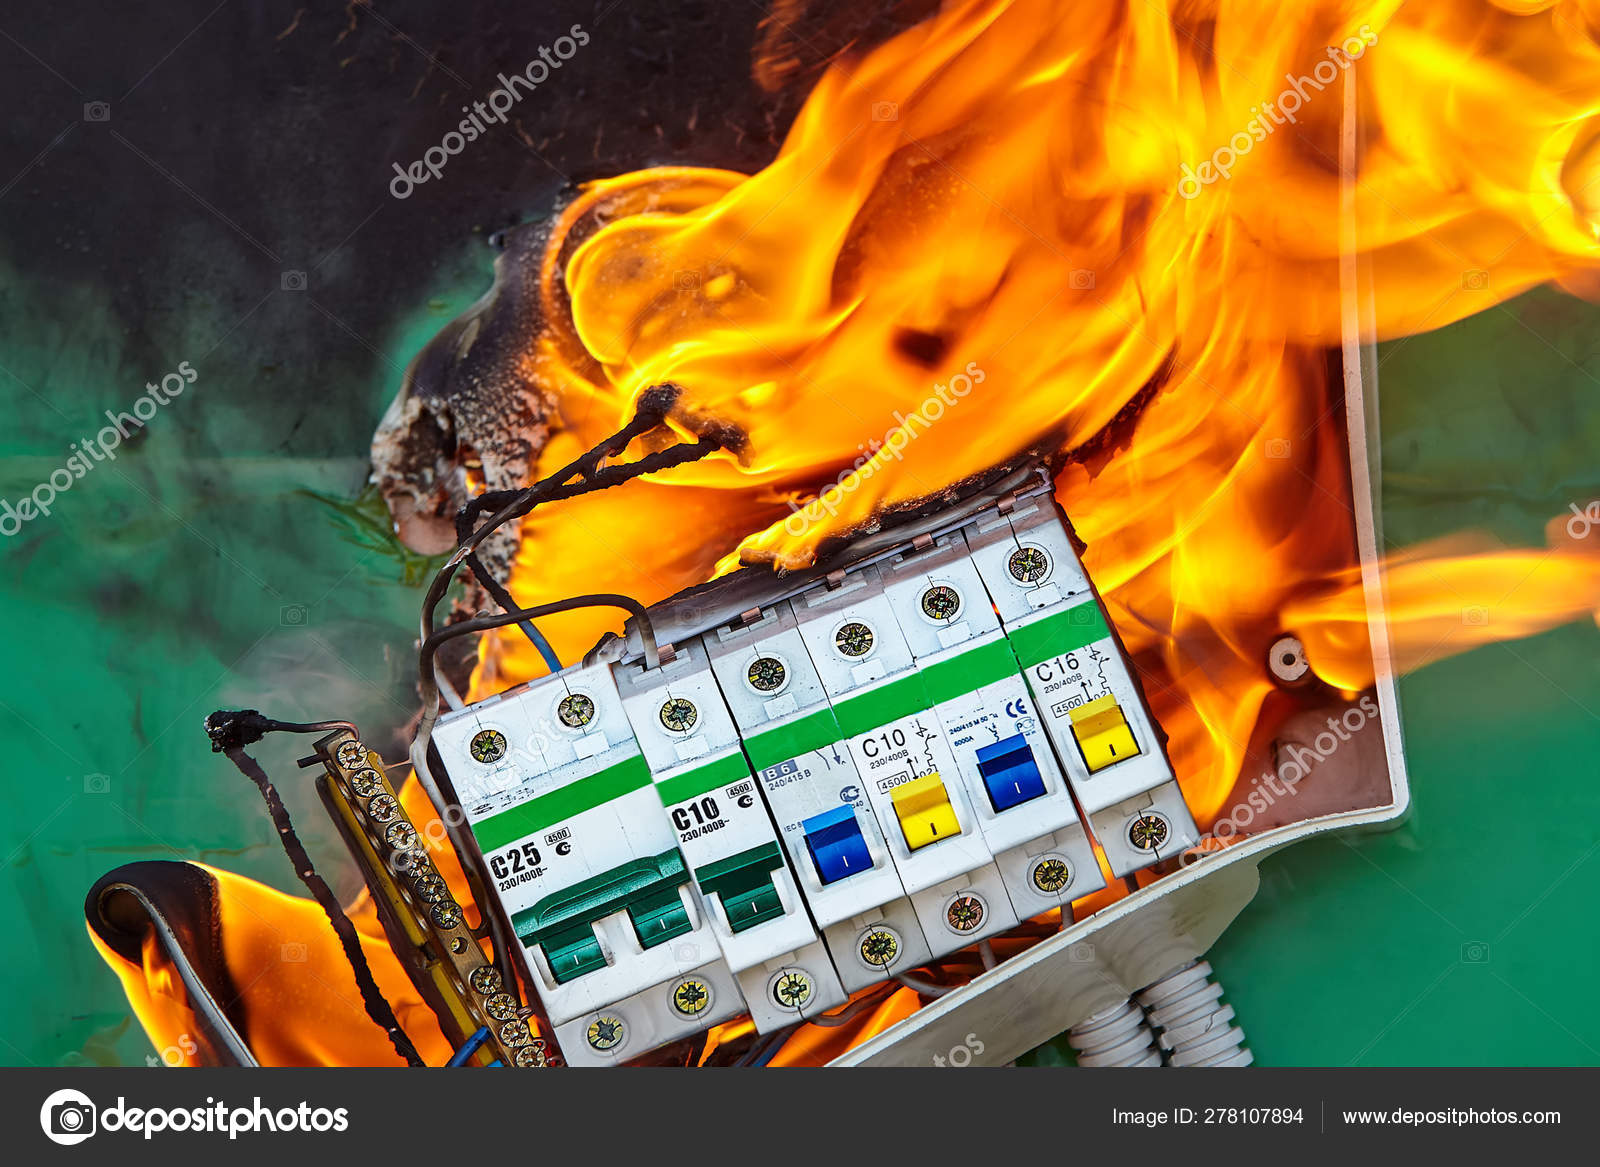 Electrical Circuit Games